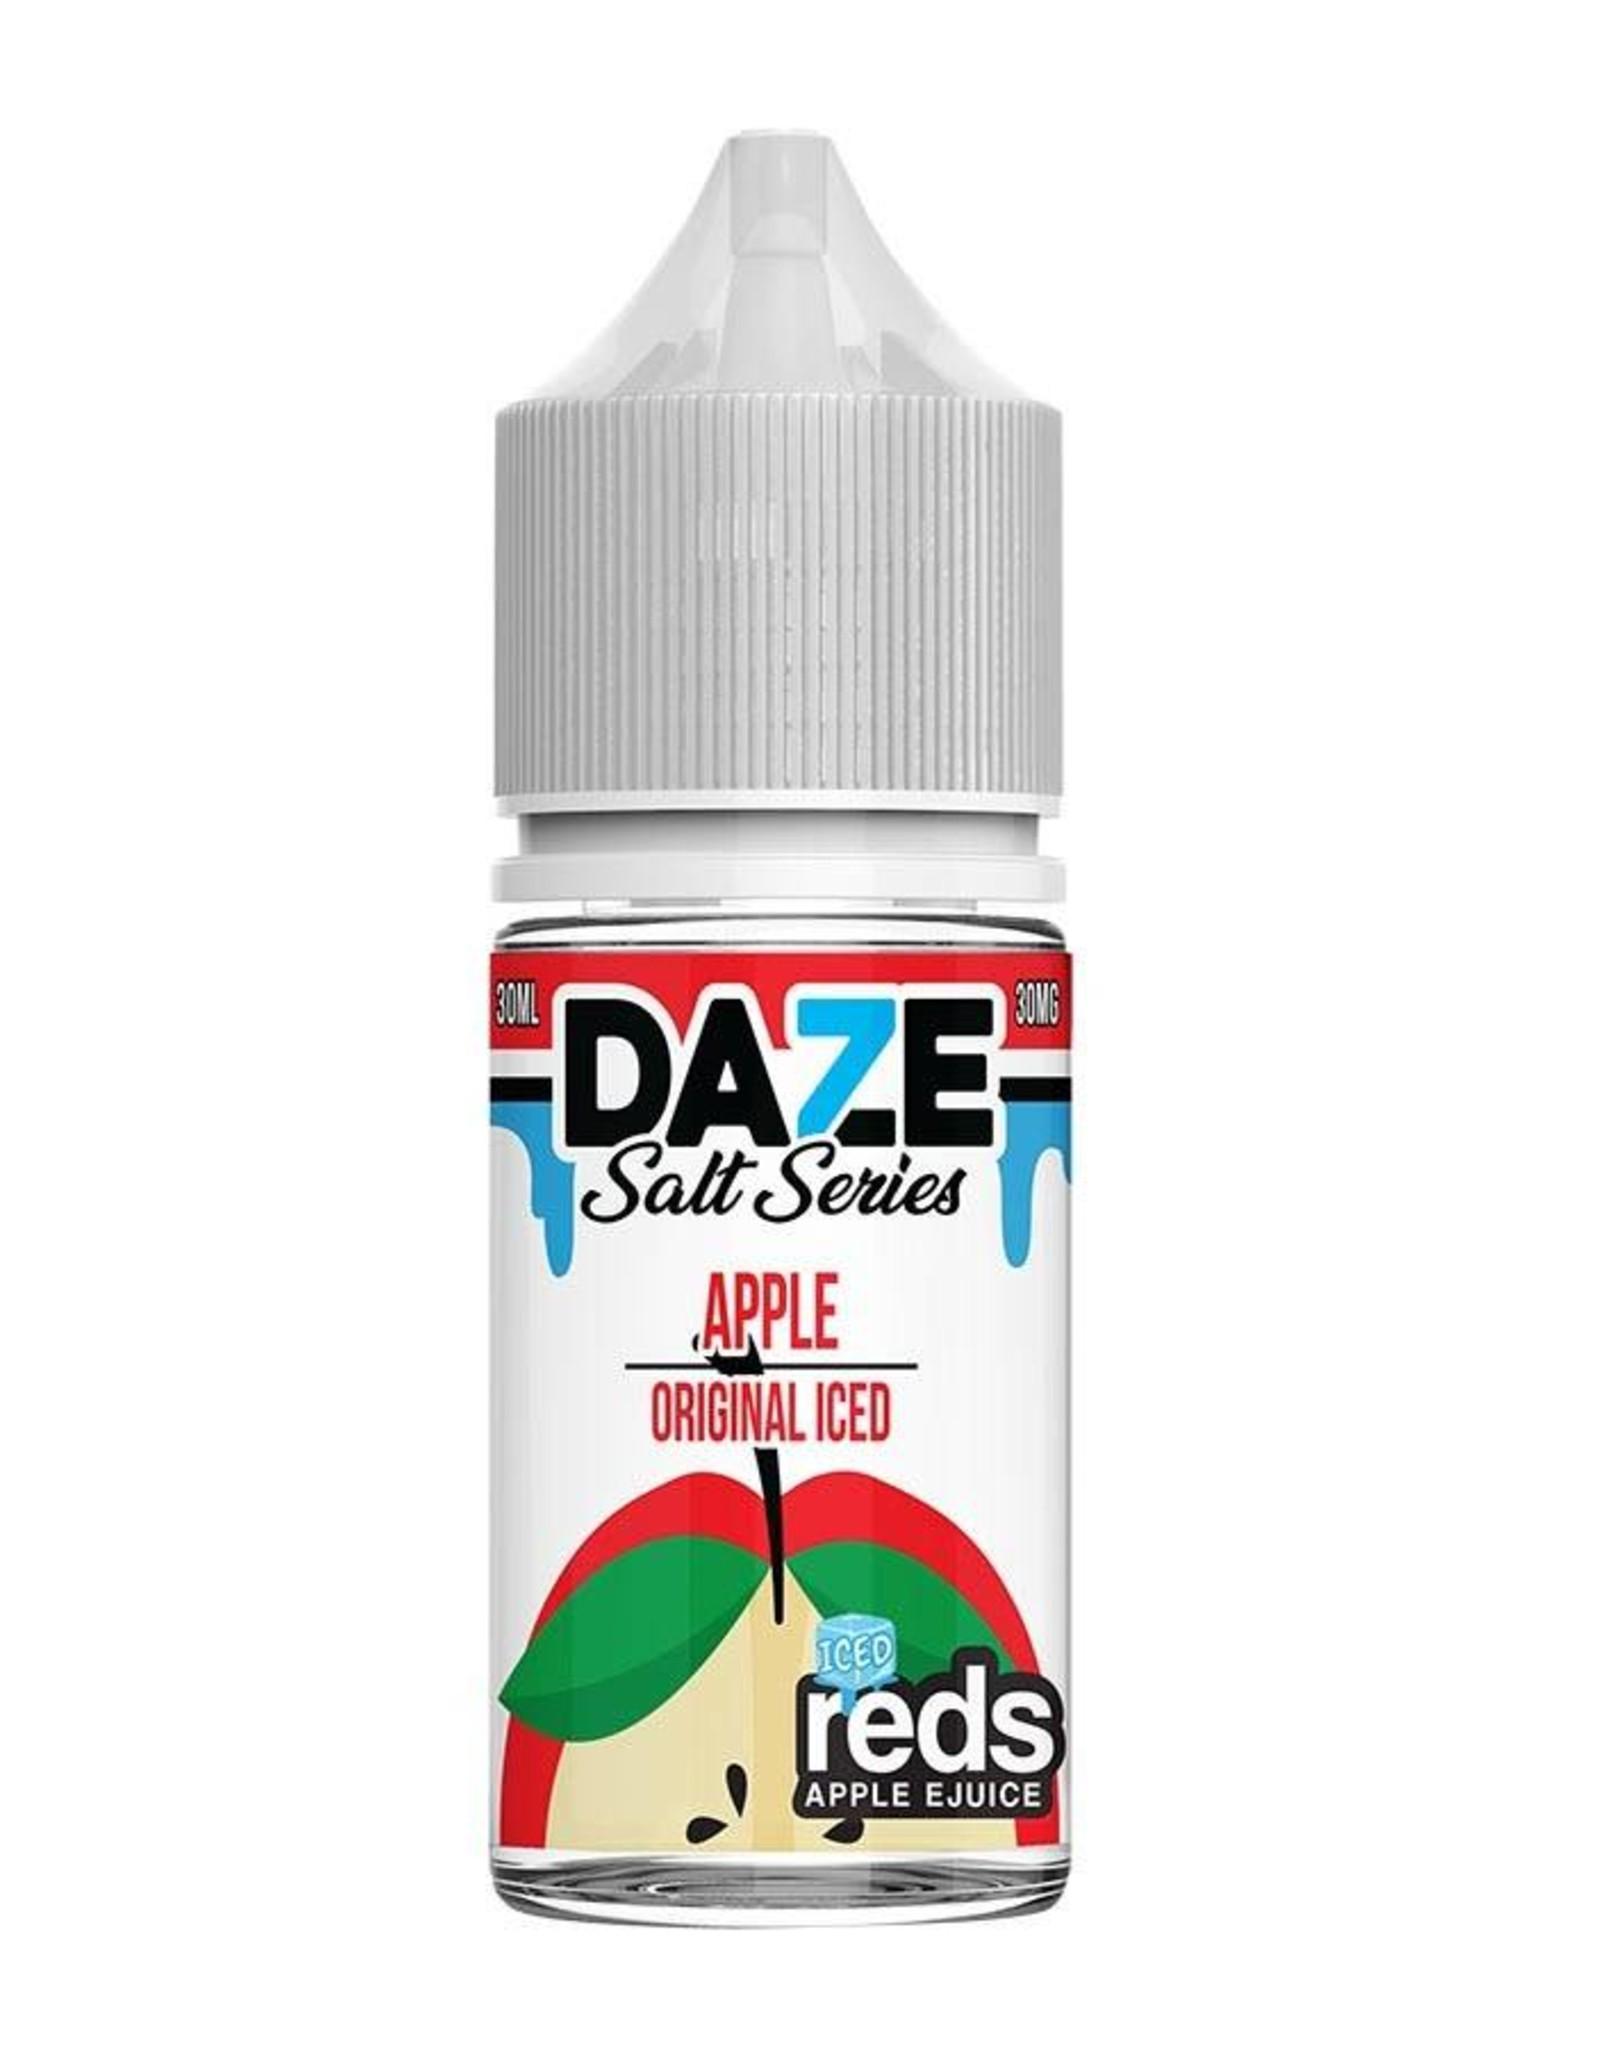 7 Daze - Salt Series Apple Iced (30mL)